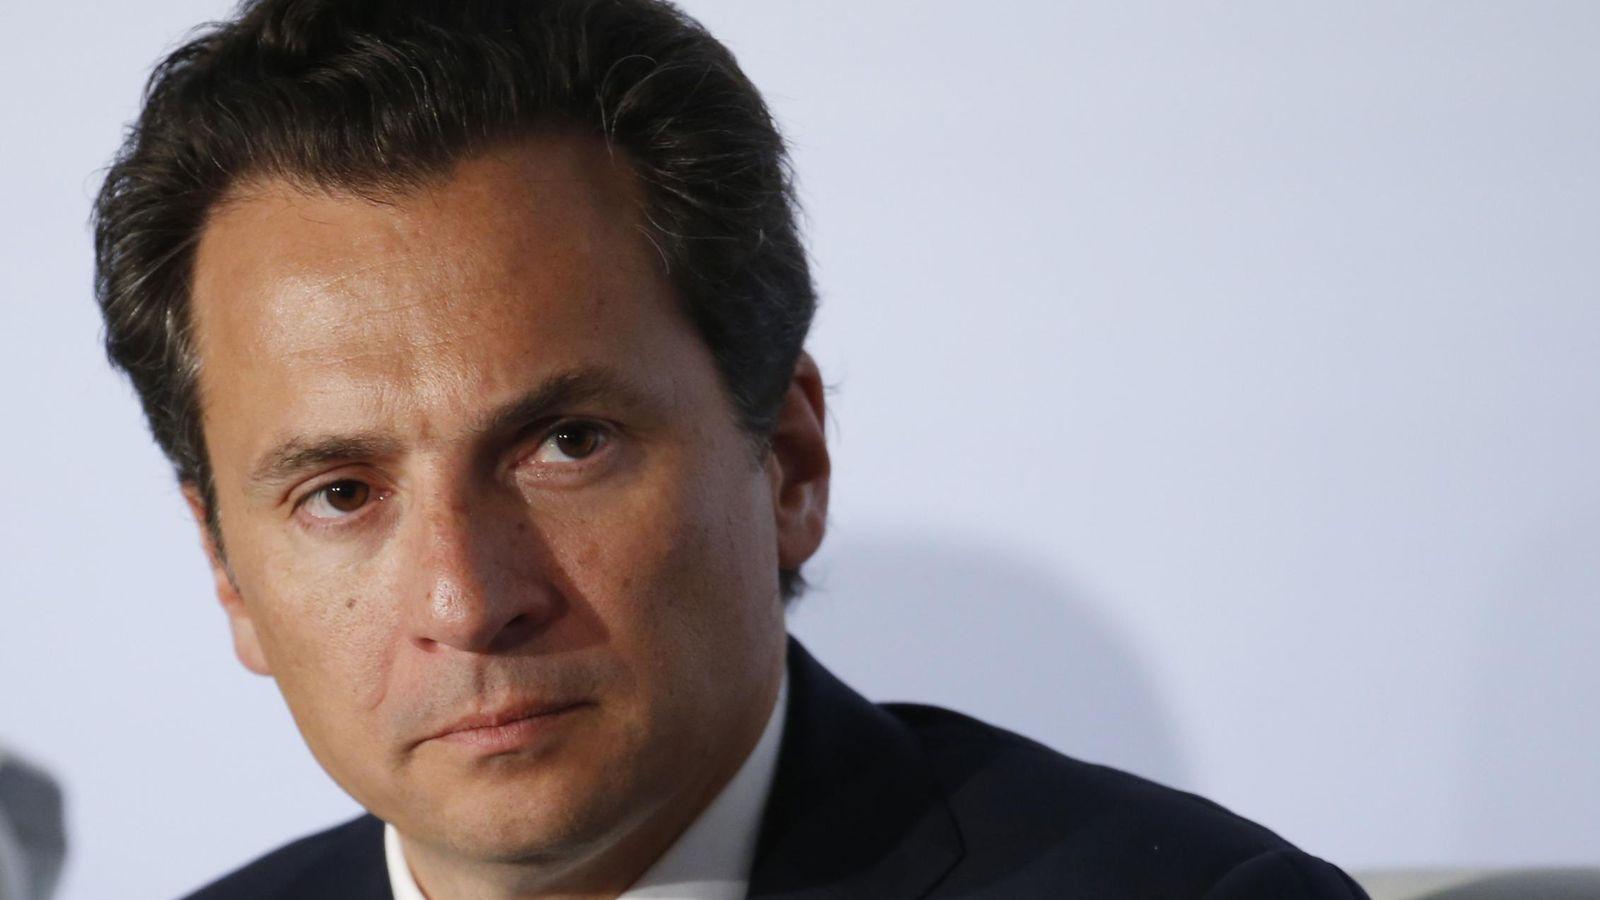 Foto: Petroleos Mexicanos (Pemex) CEO Emilio Lozoya, attends the Oil and Gas Climate Initiative summit Paris